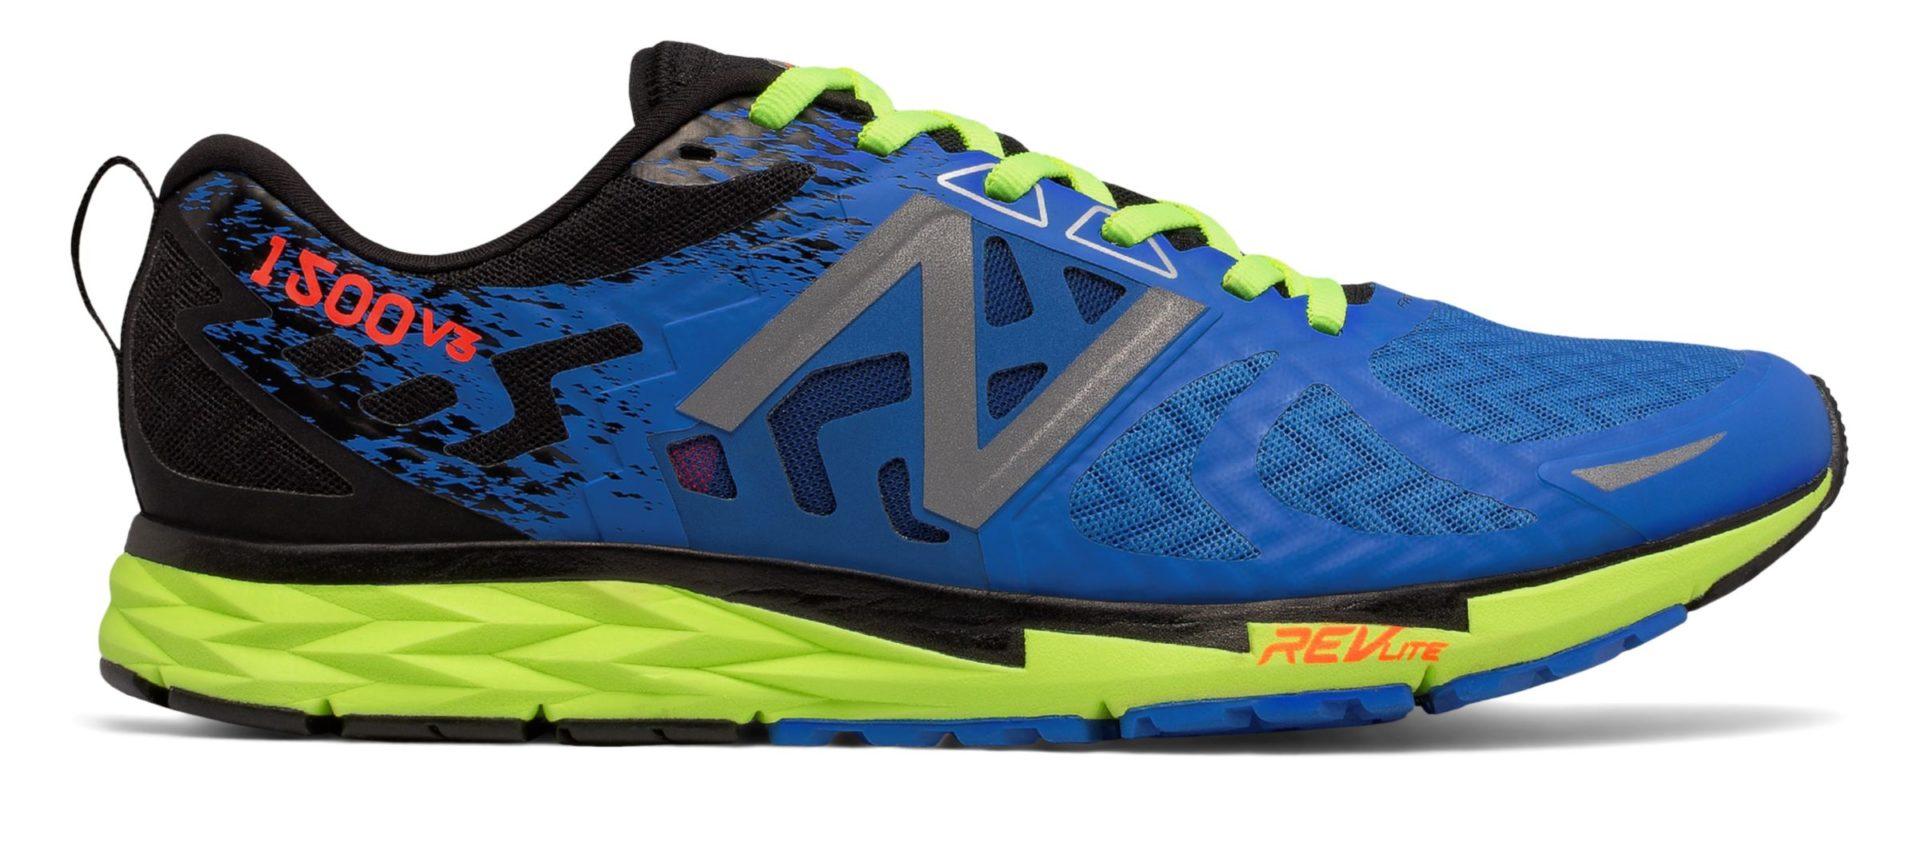 buy popular f0dbd c6de5 New Balance 1500v3 Men's Running Shoes - M1500BG3